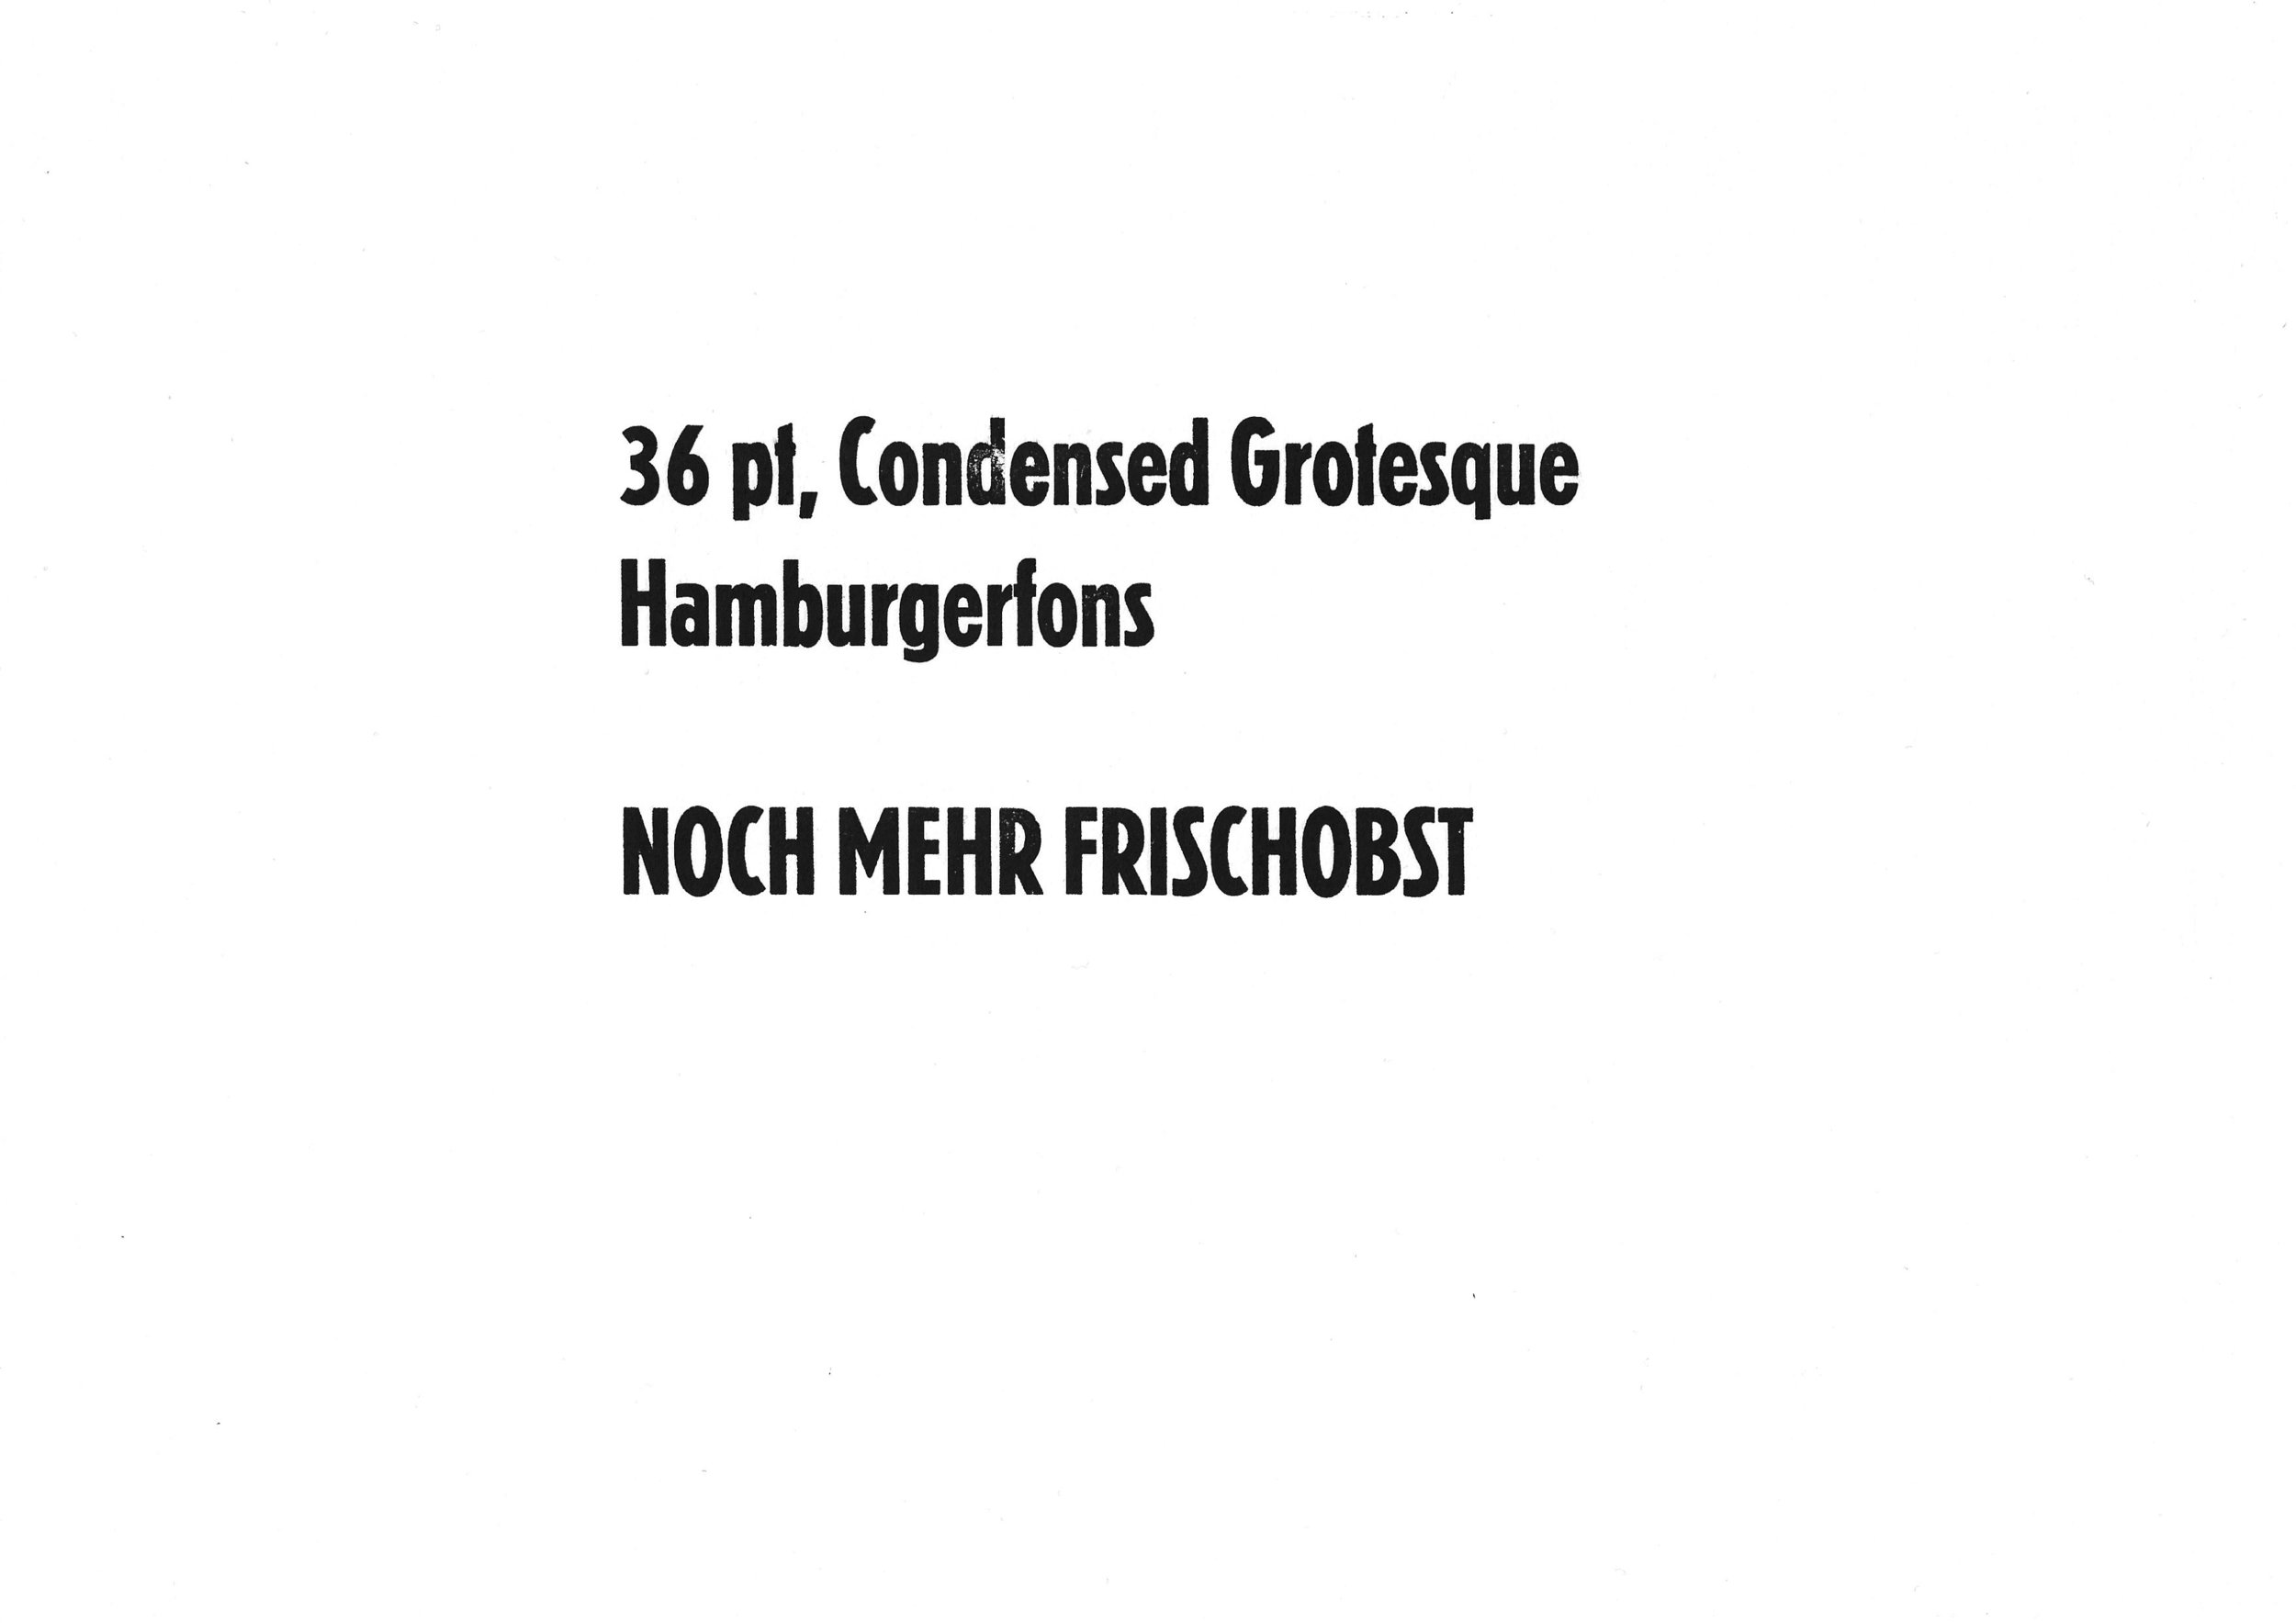 36pt. Condensed Grotesk